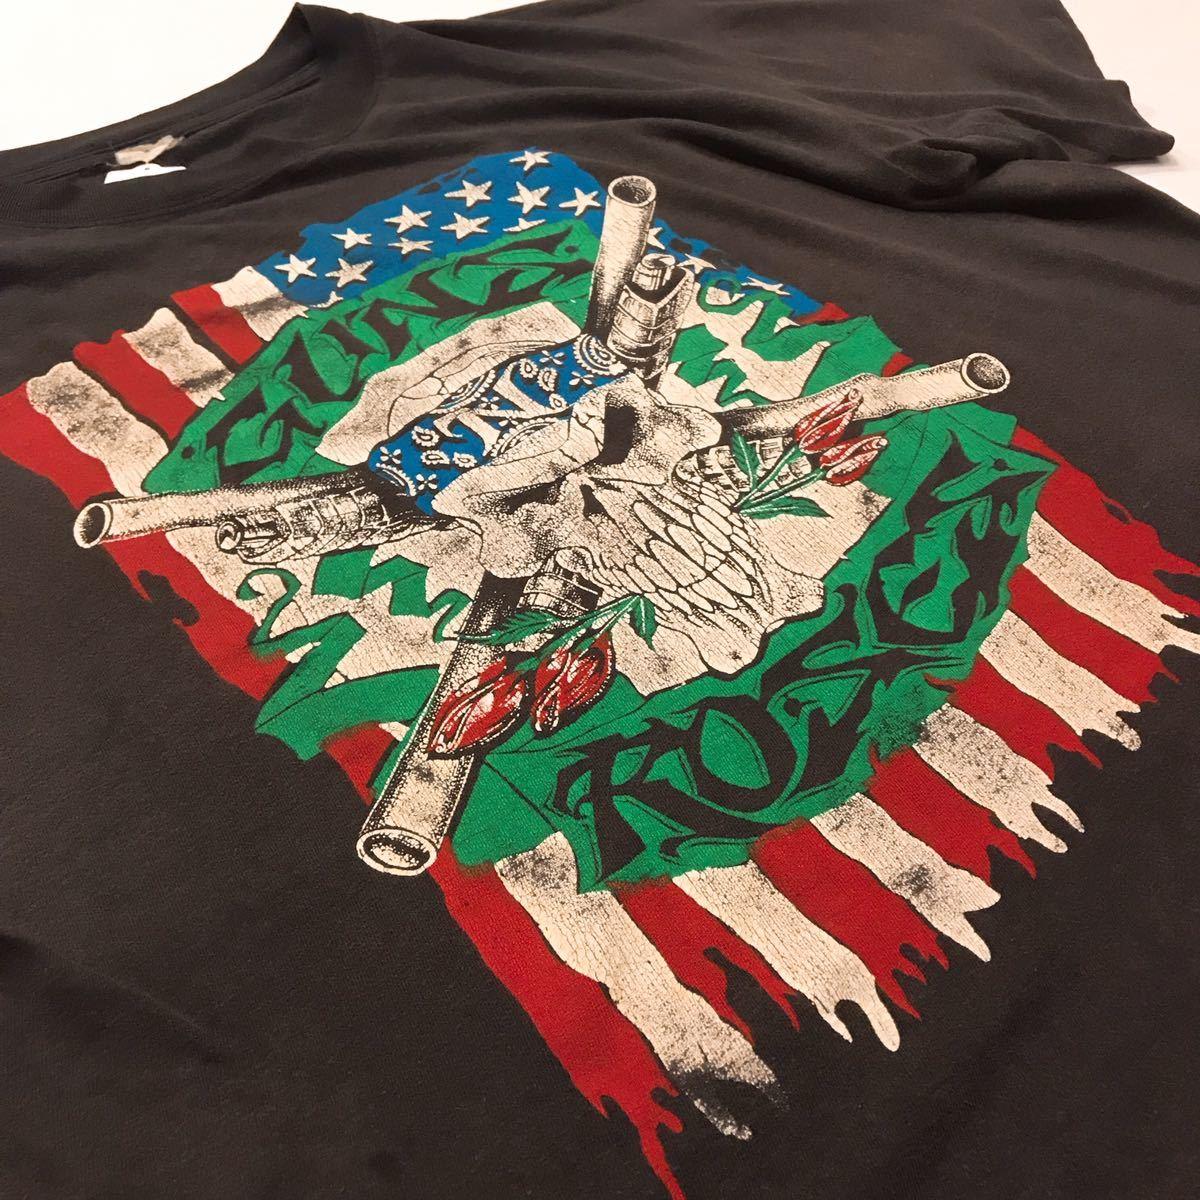 90s 90年代 GUNS N ROSES METALLICA ガンズアンドローゼズ メタリカ バンドT ロックT ツアーT VINTAGE ビンテージ 1992 Stadium Tour XL_画像2